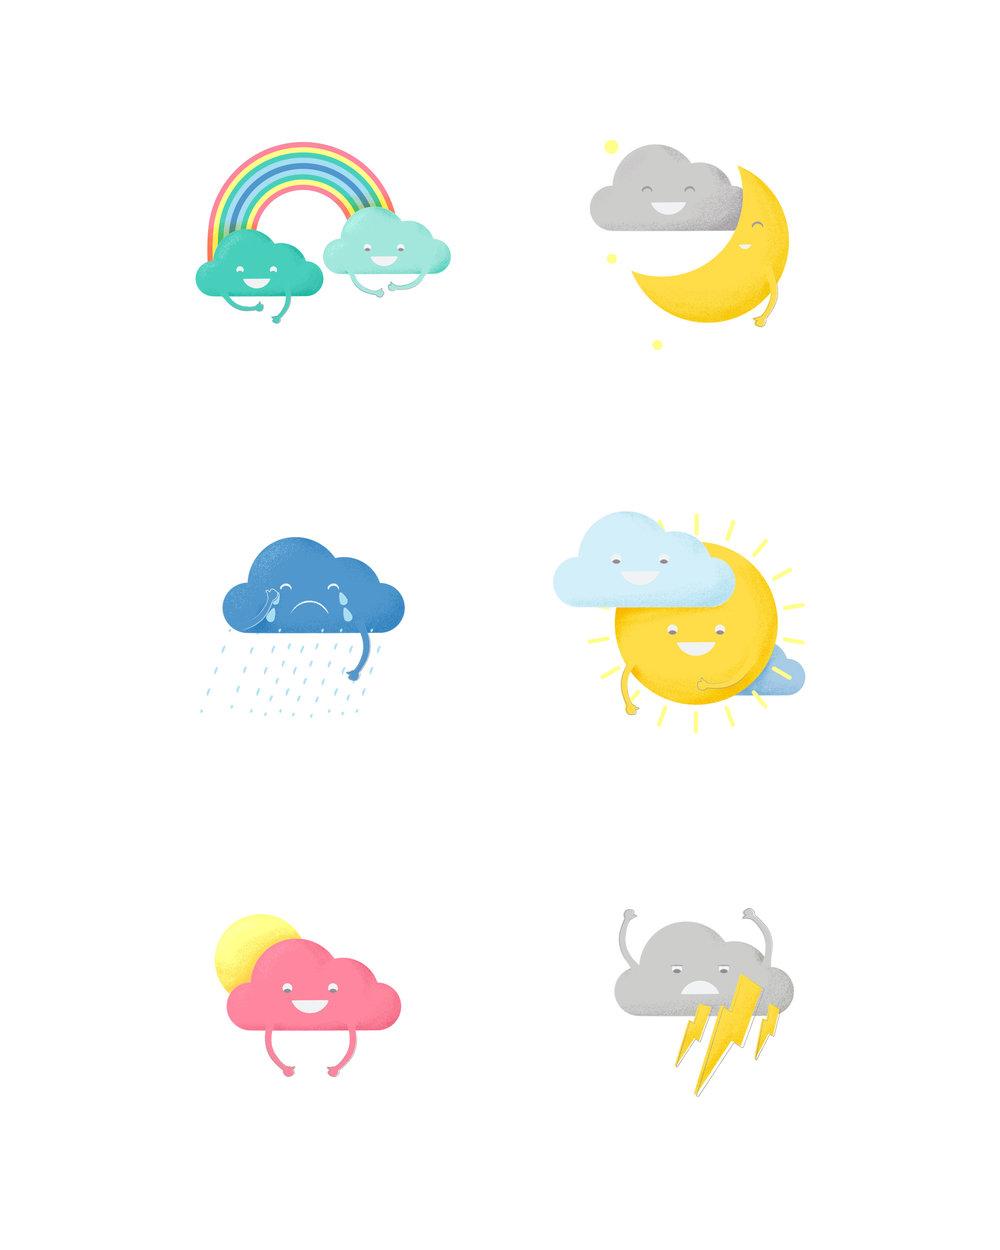 stickers-2.jpg